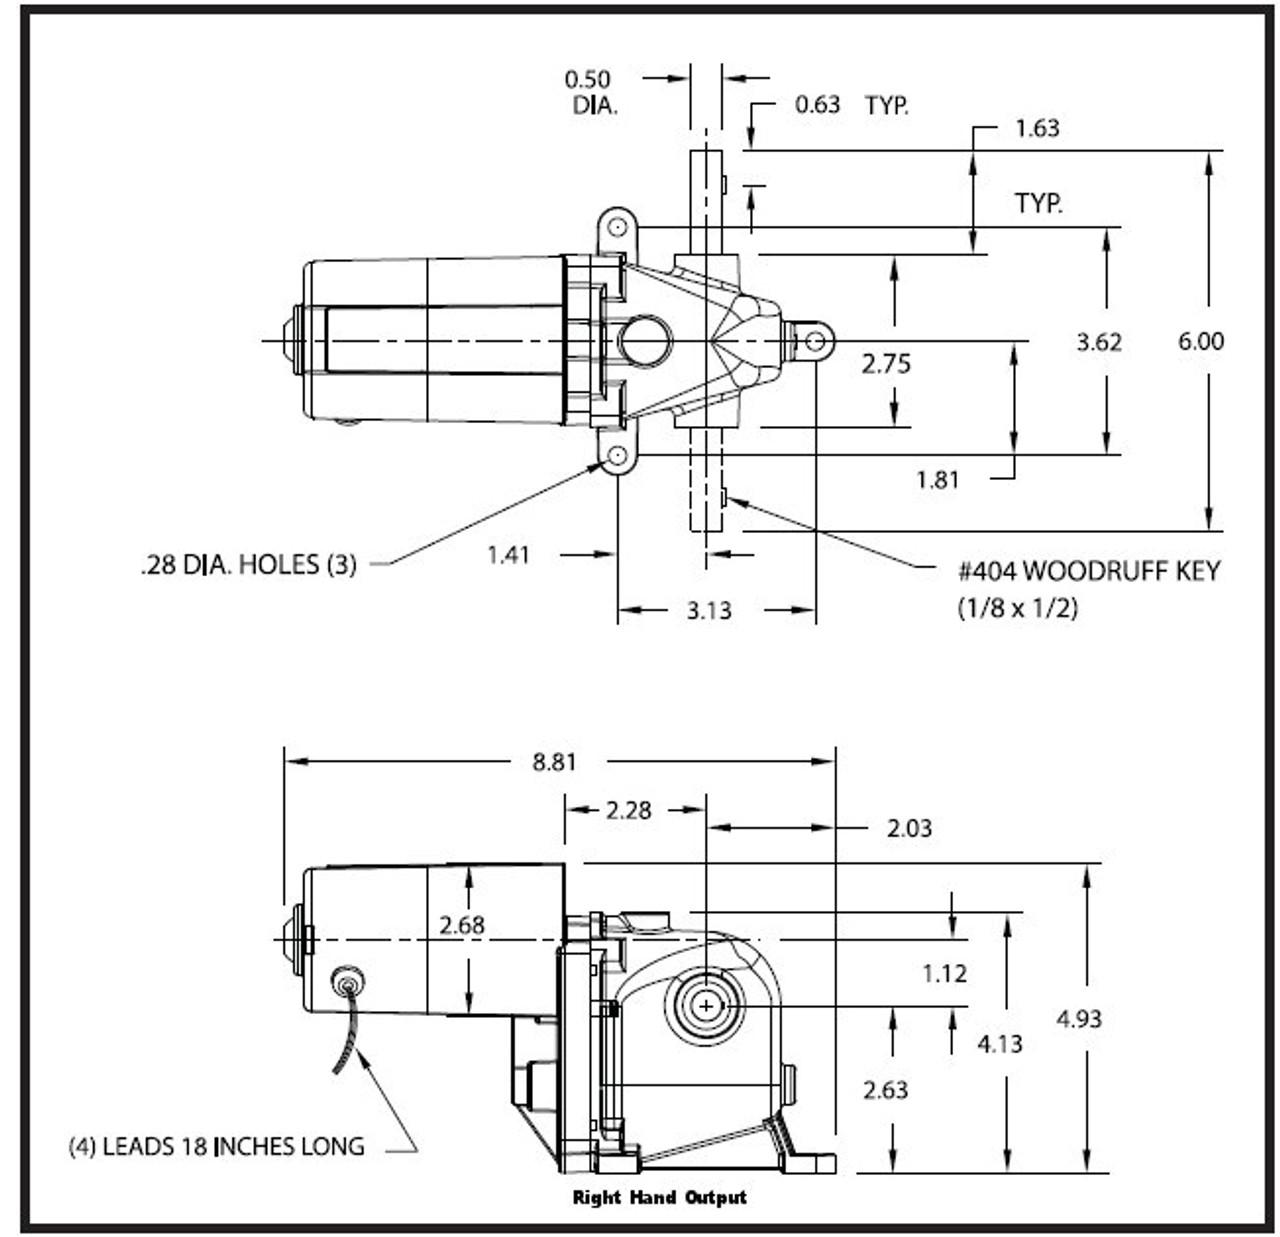 [SCHEMATICS_48IS]  Dayton Model 1LPZ5 AC/DC Left Hand Gearmotor 55 RPM 1/15 hp 115V AC (1L482) | 12 Lead Motor Wiring Diagram Dayton |  | Electric Motor Warehouse